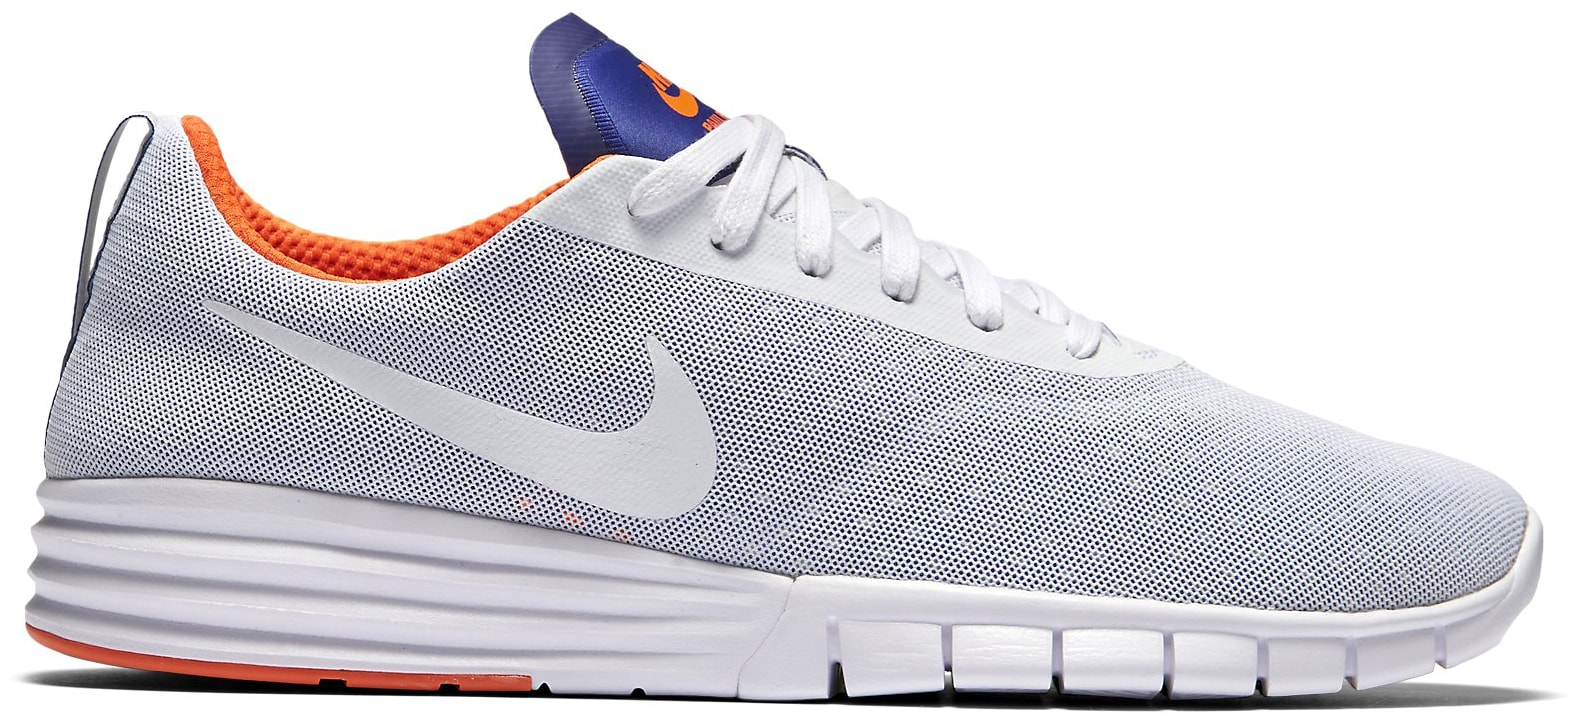 ab6ee08d8b8e Nike SB Lunar Paul Rodriguez 9 Skate Shoes - thumbnail 1